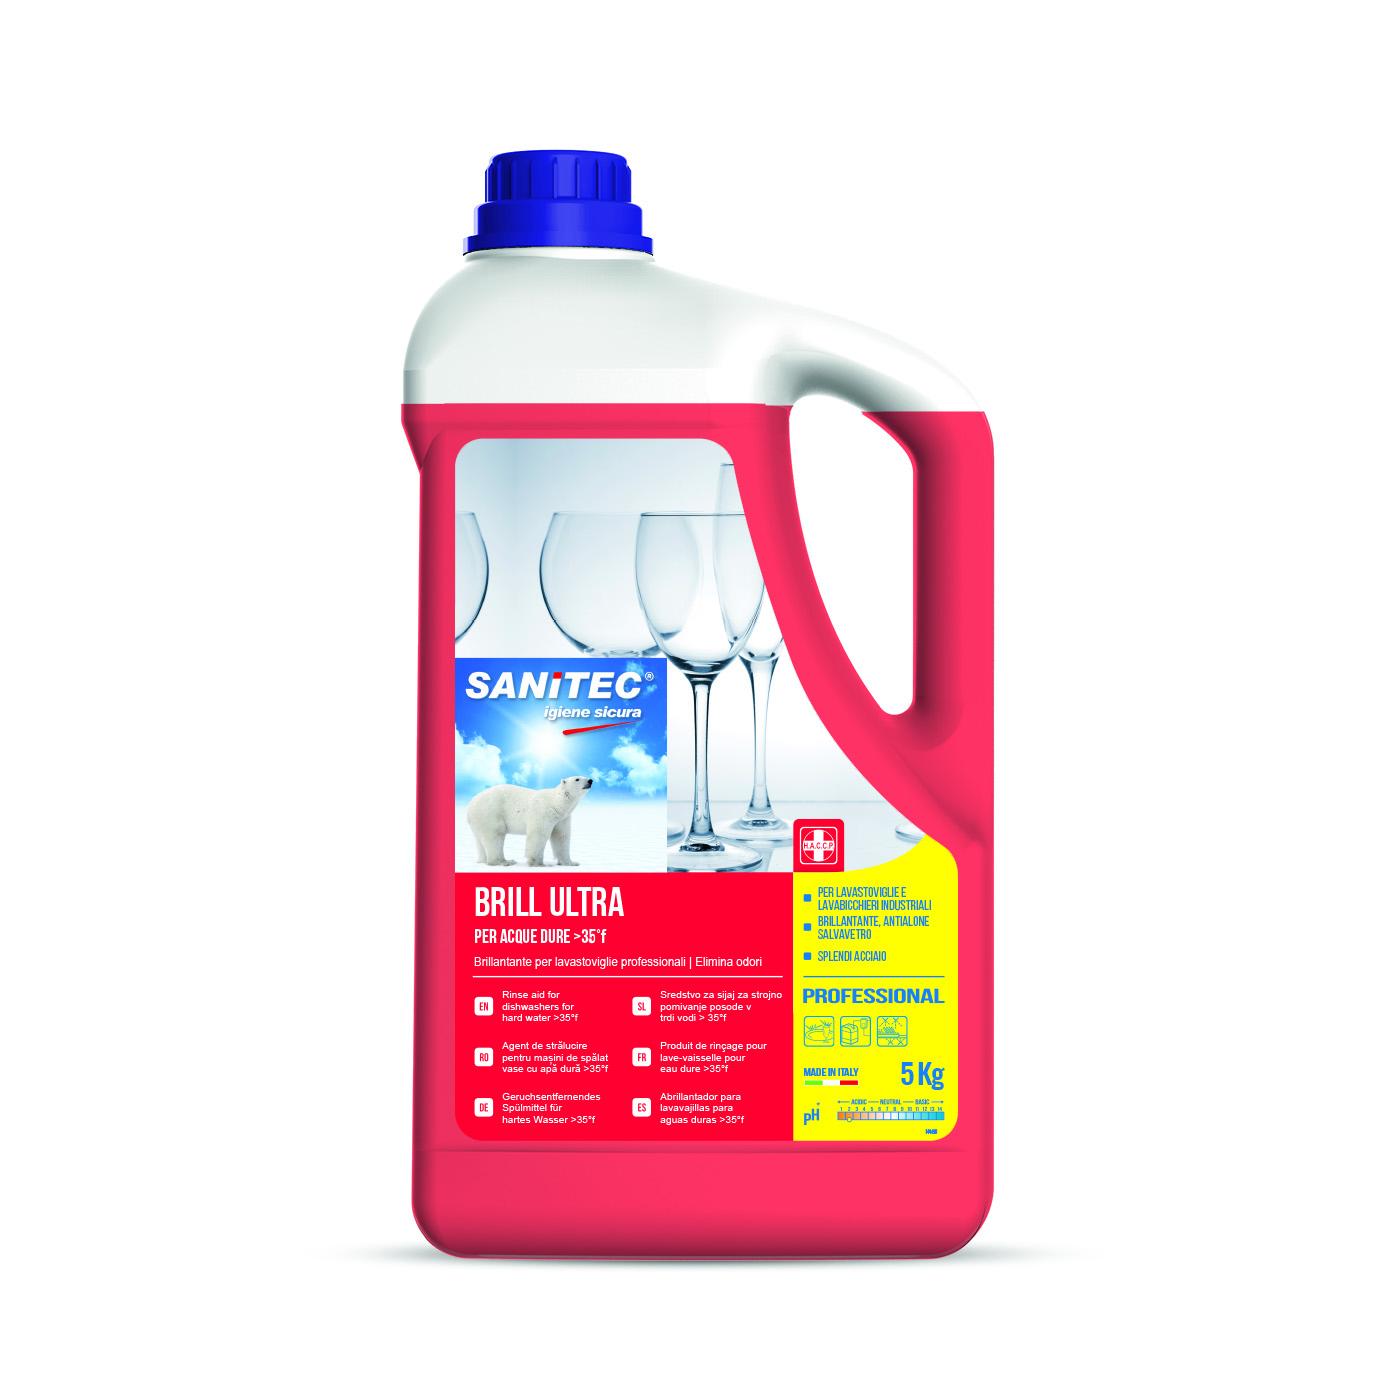 Brill Utra Rinse Aid